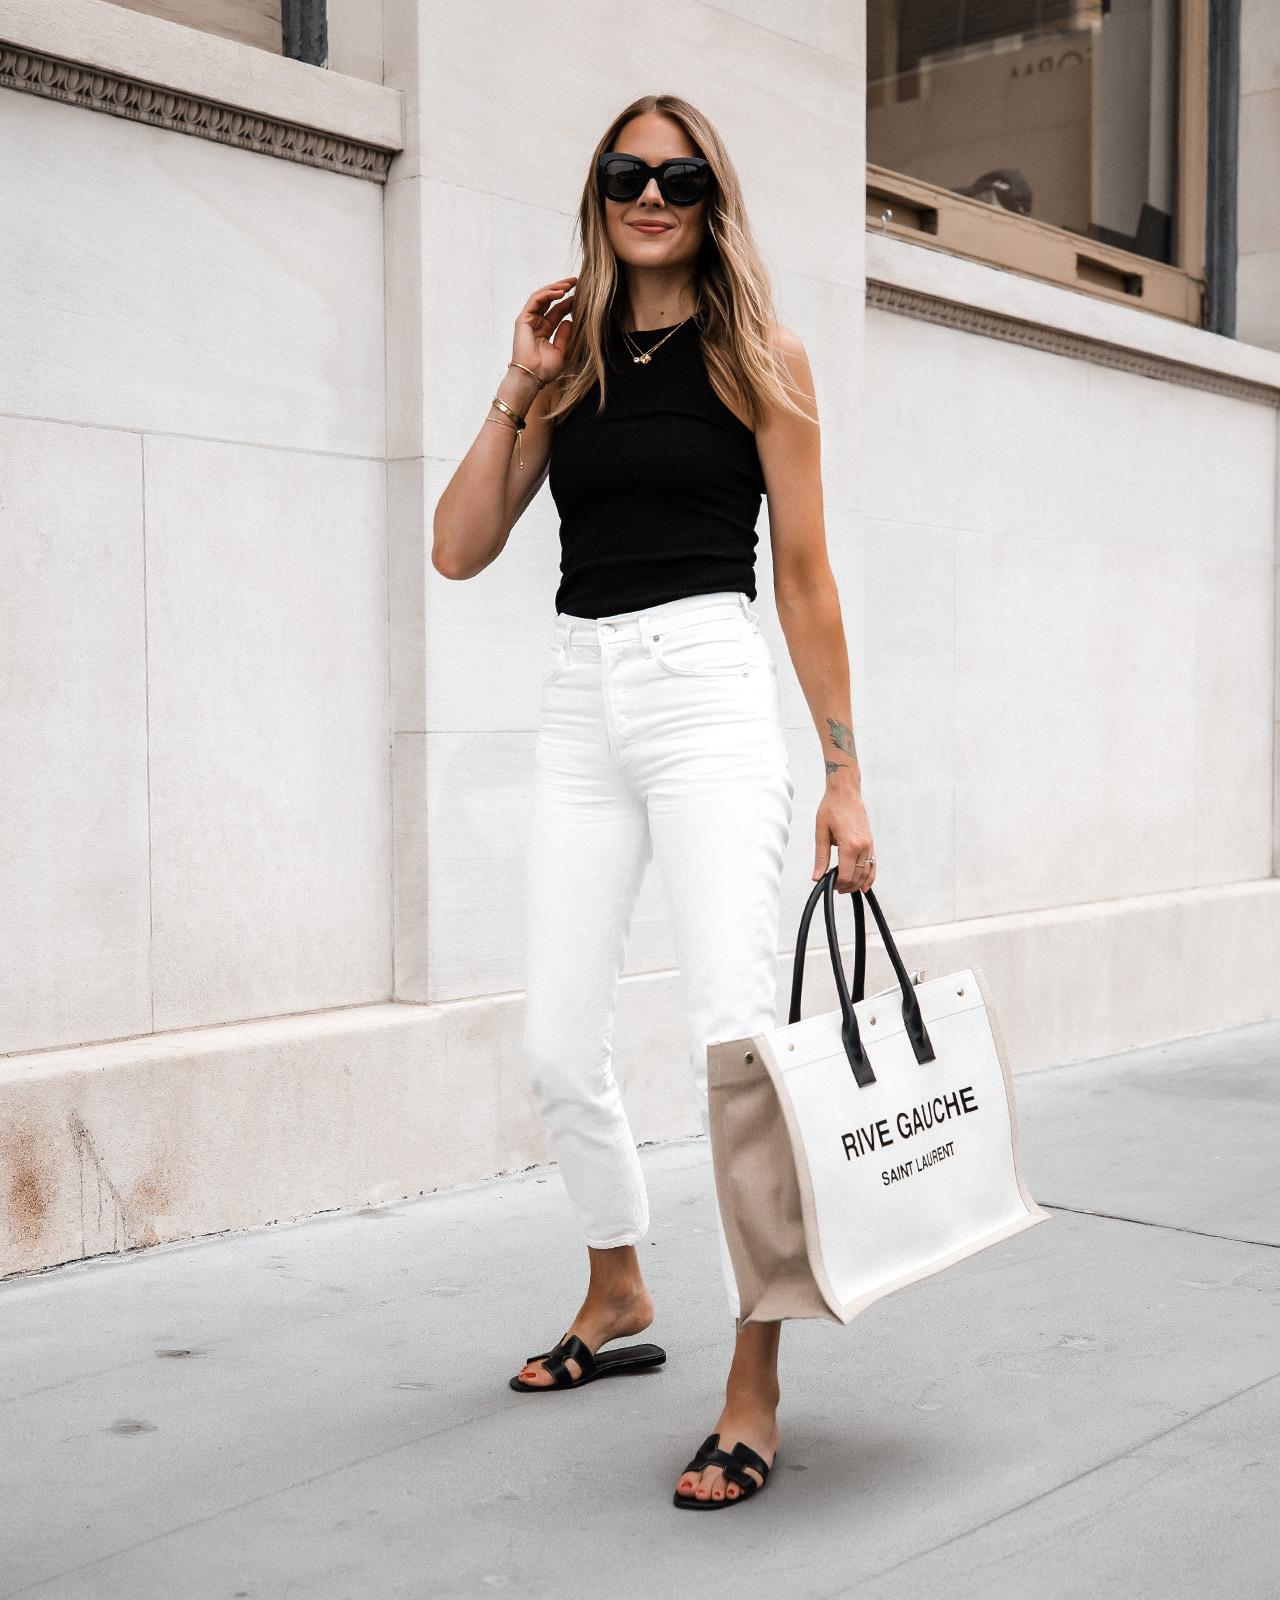 Fashion Jackson Wearing White Jeans with Black Tank Top Black Hermes Oran Sandals Saint Laurent Tote